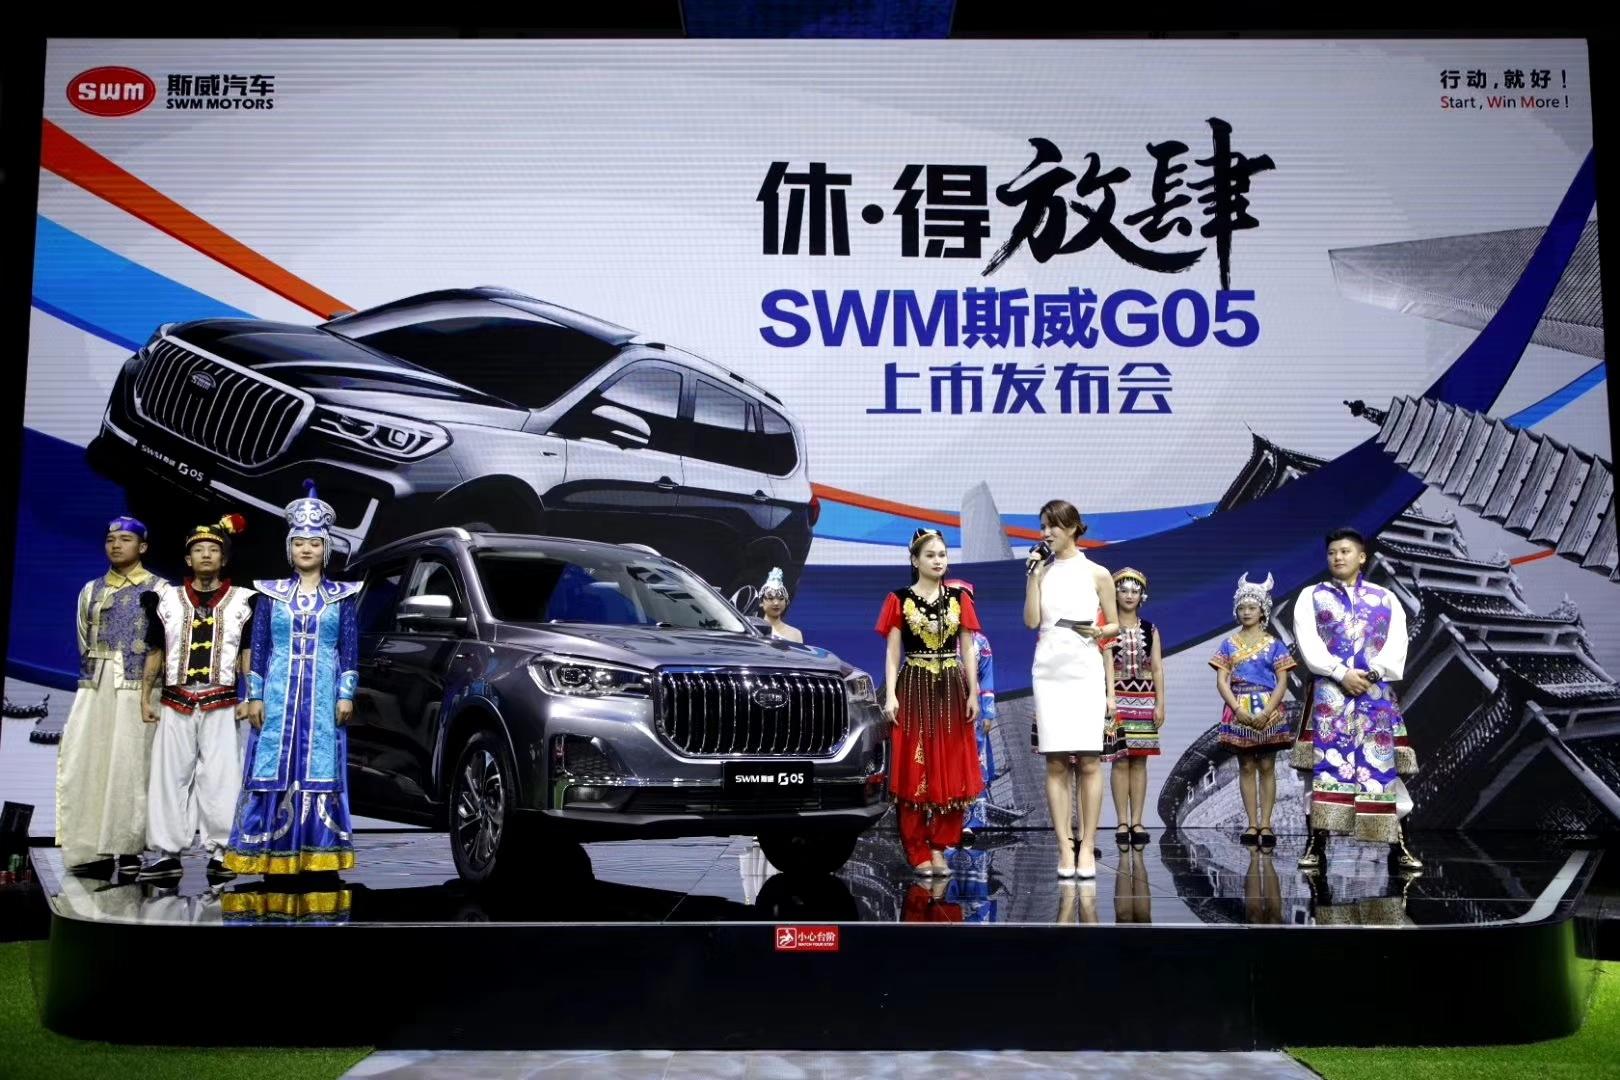 SWM斯威G05成都车展全球上市 售价6.99万-10.39万元